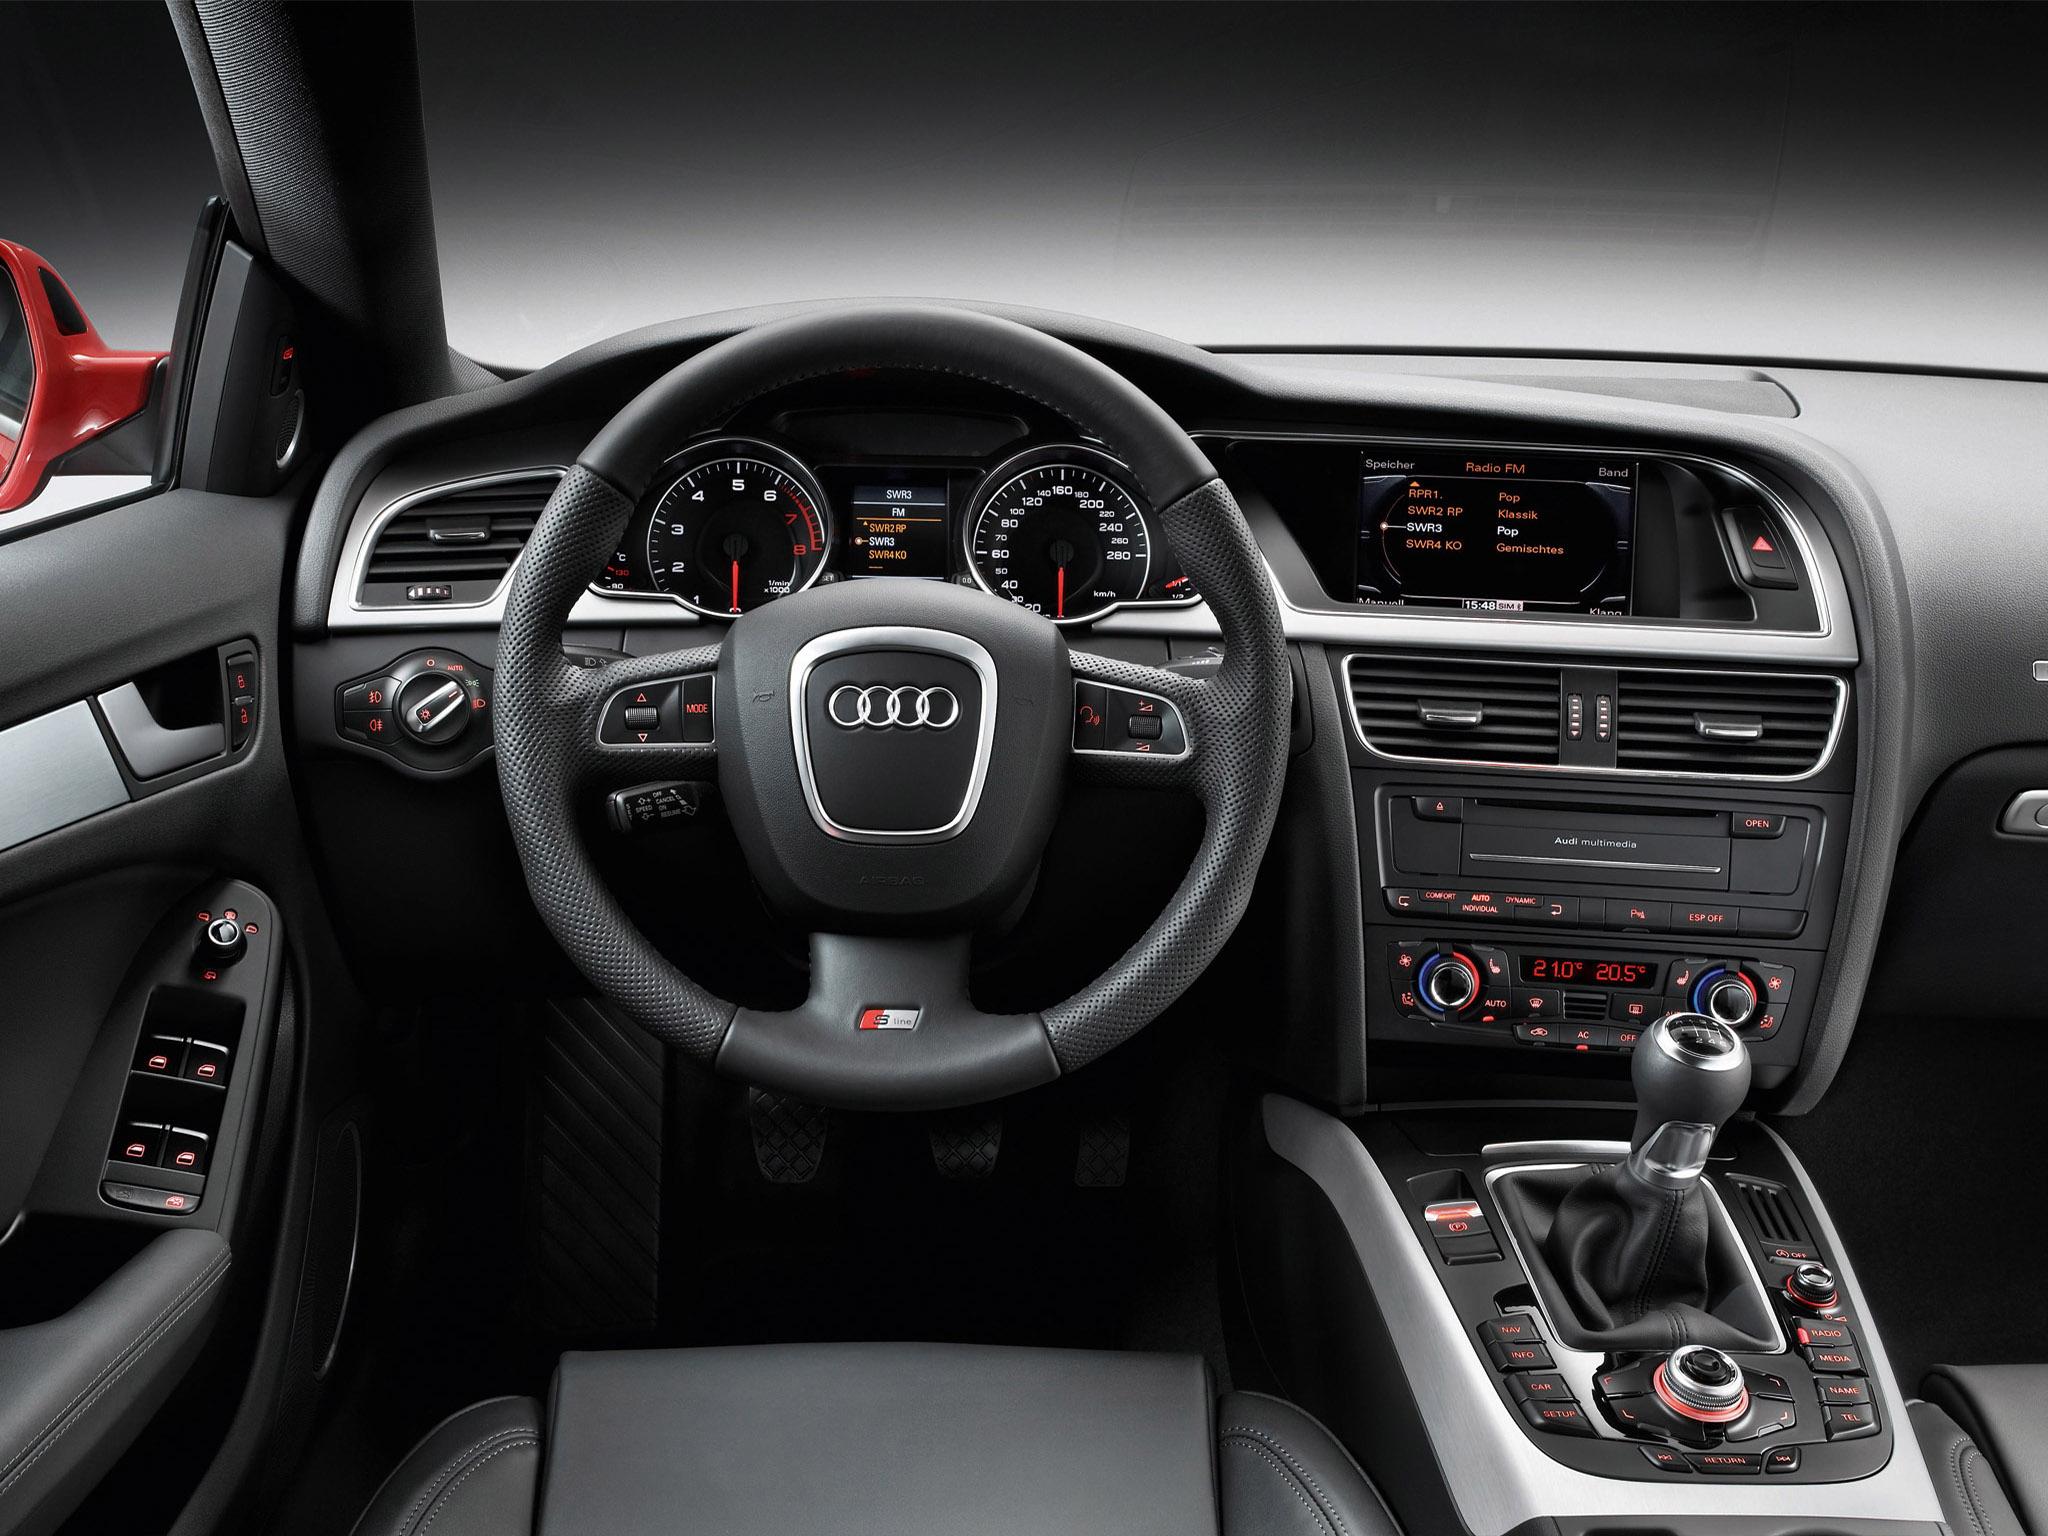 Audi A5 Sportback 2 0 Tfsi S Line 2009 Audi A5 Sportback 2